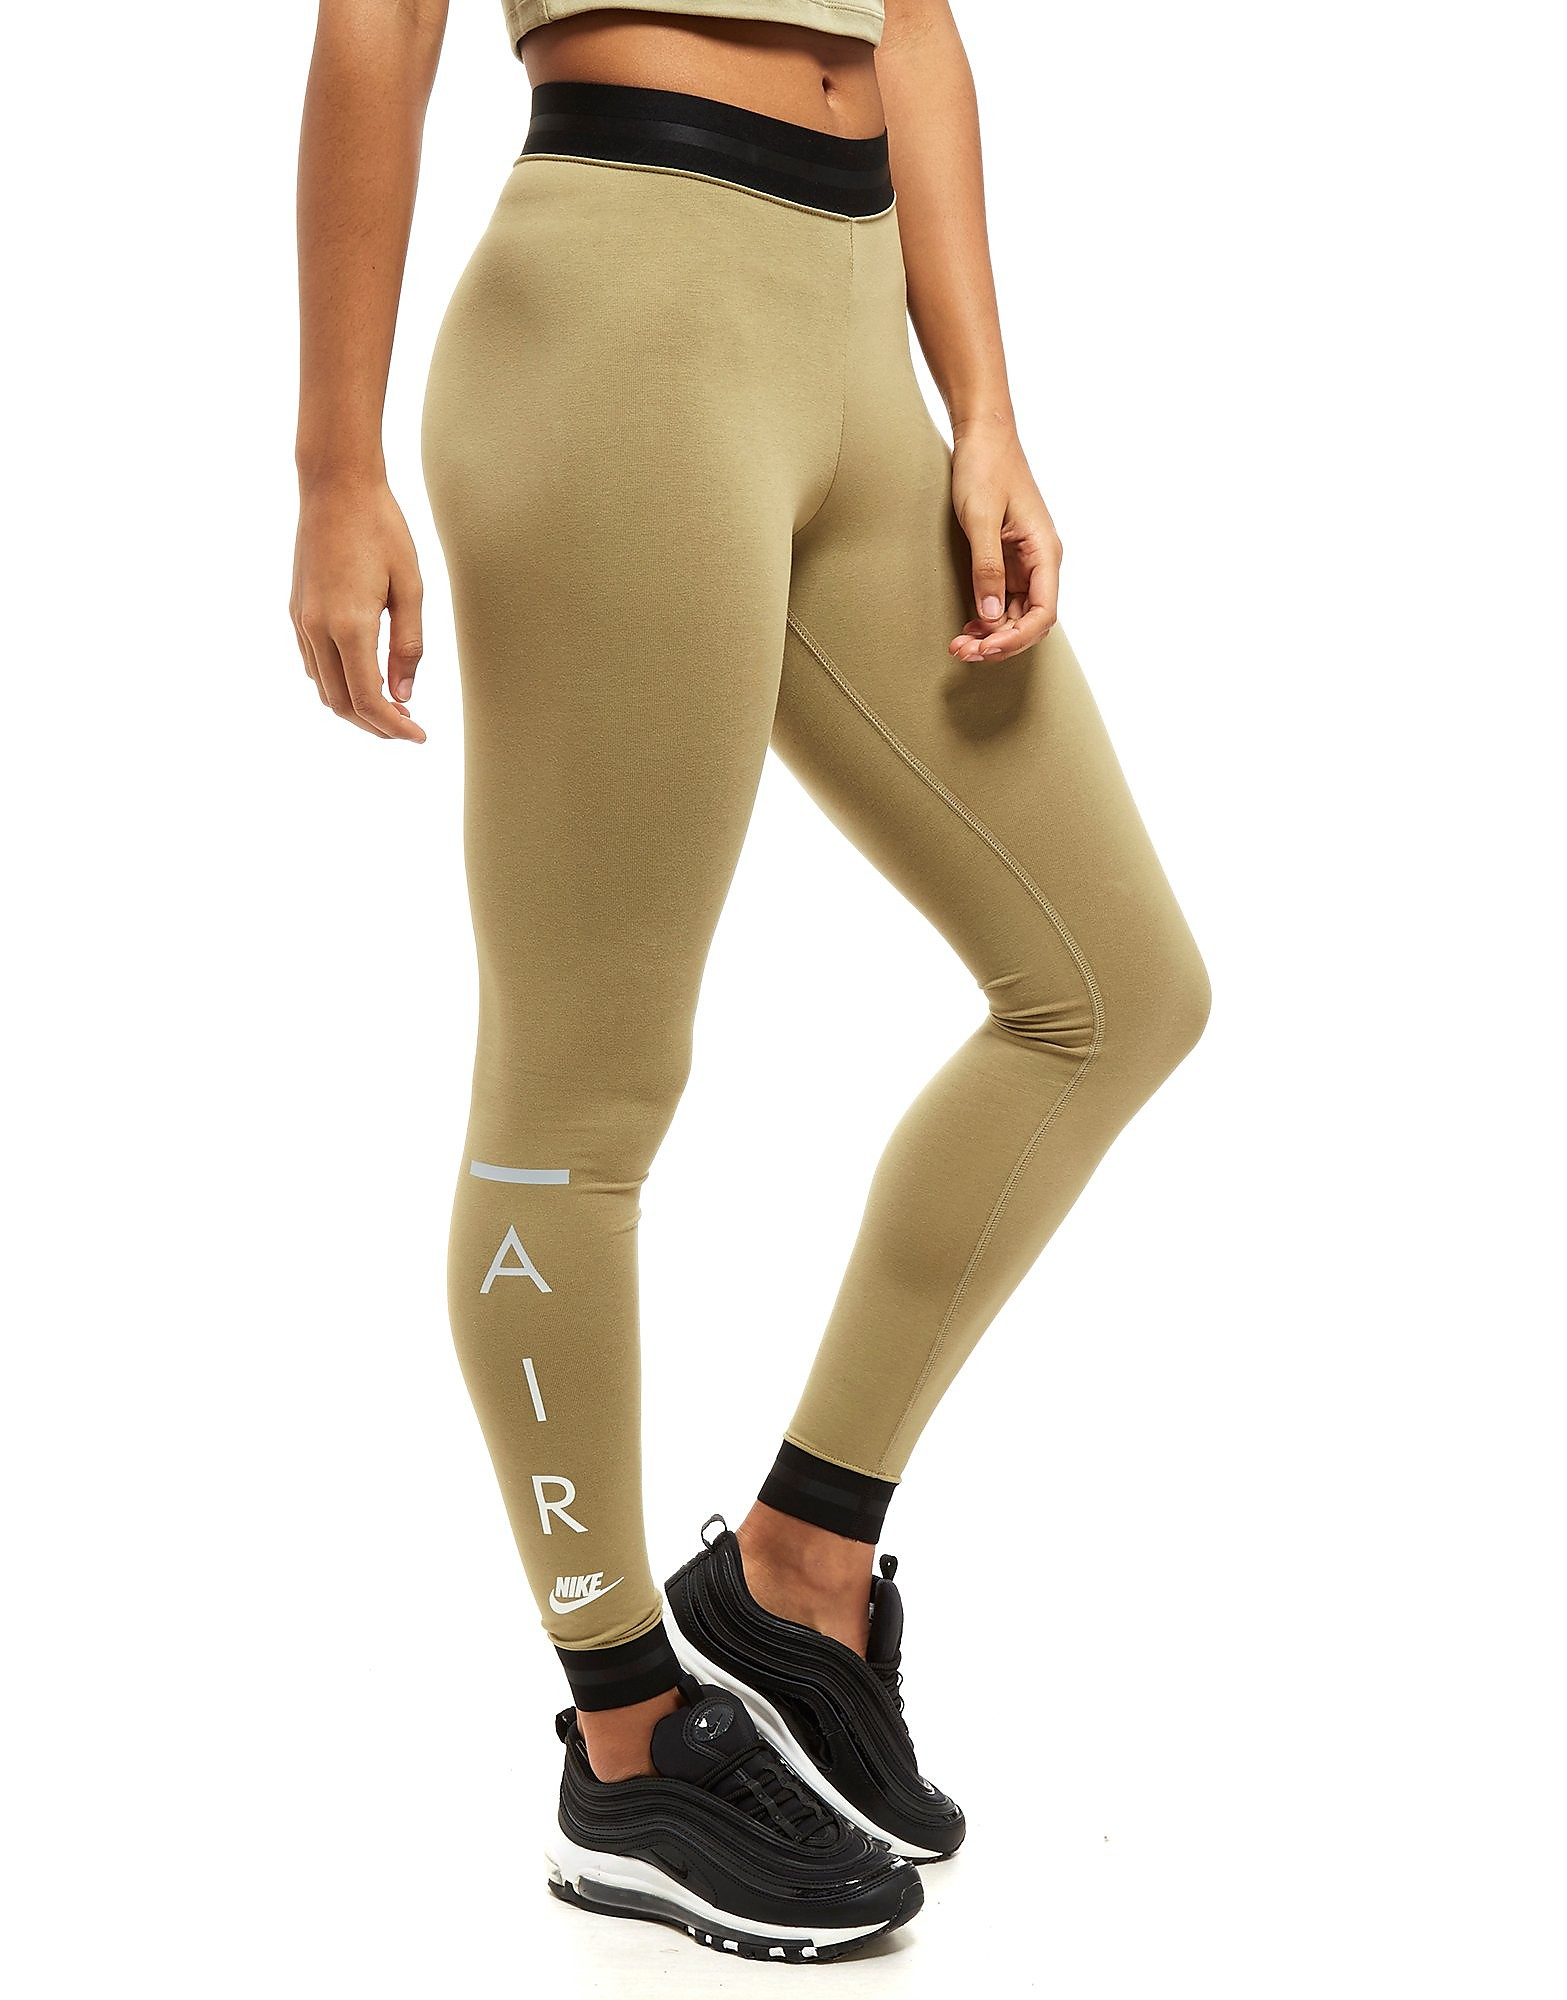 Nike Legging Air Femme